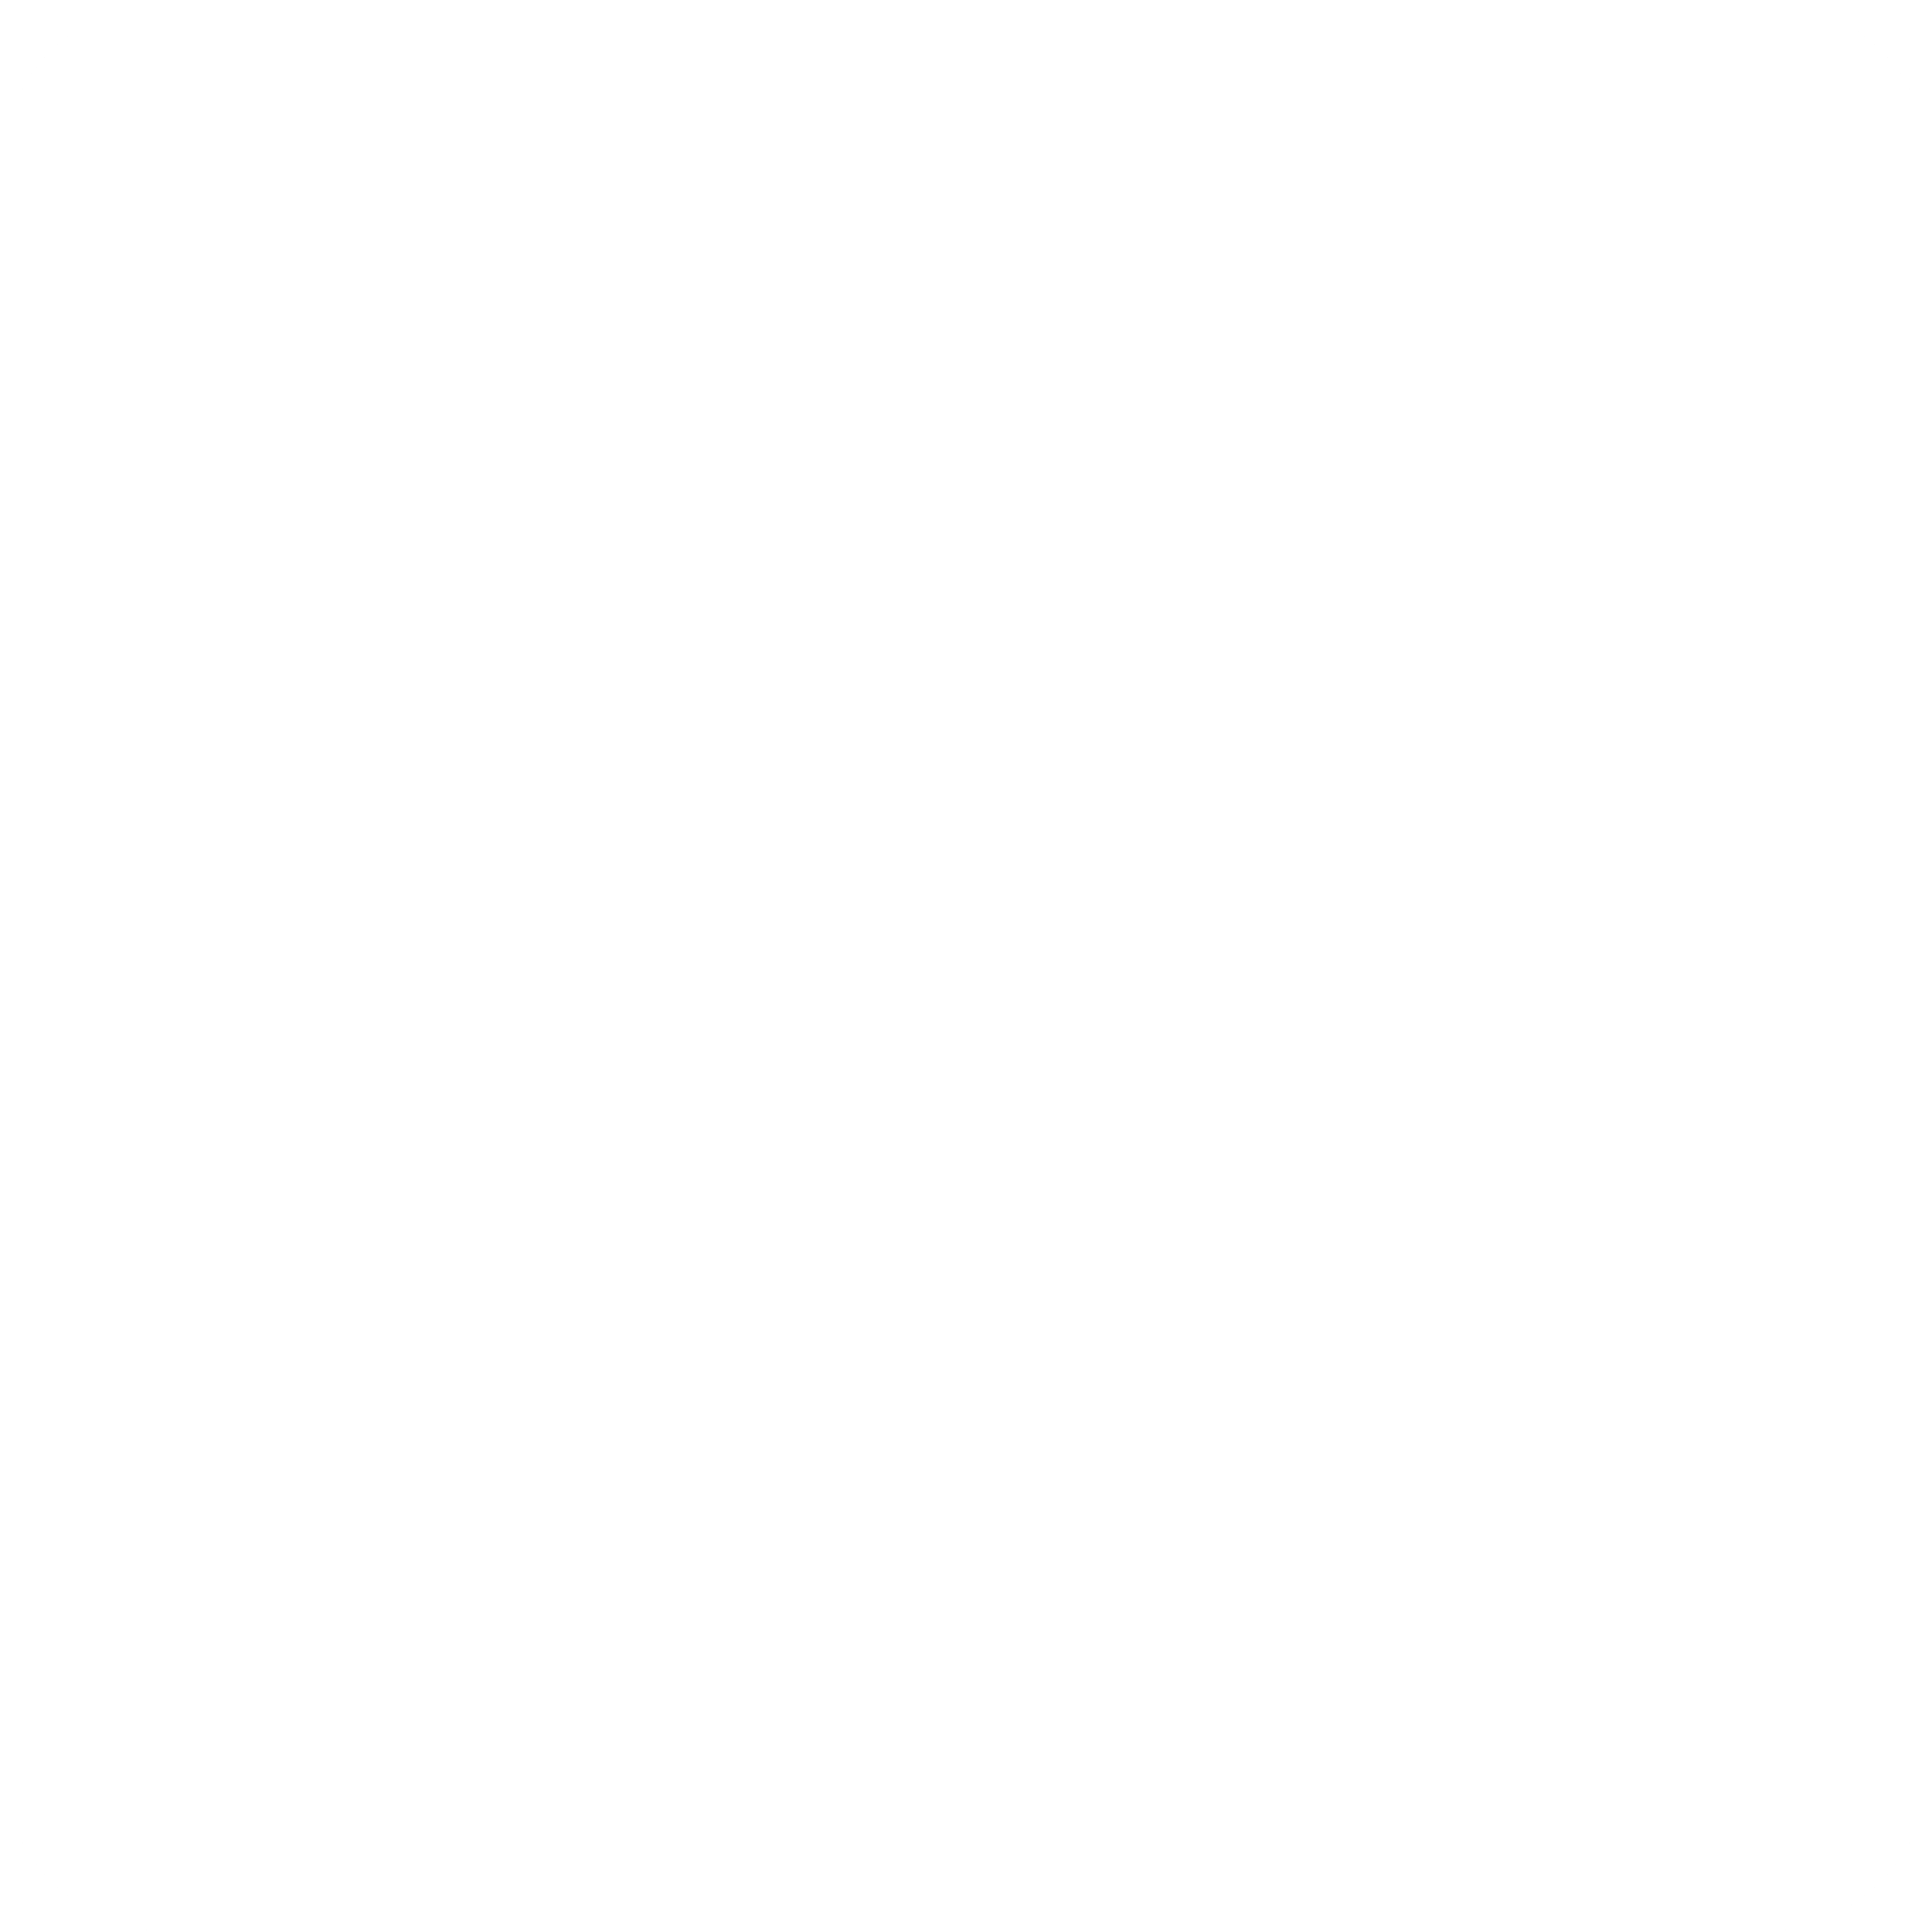 Invision Logo Png Transparent